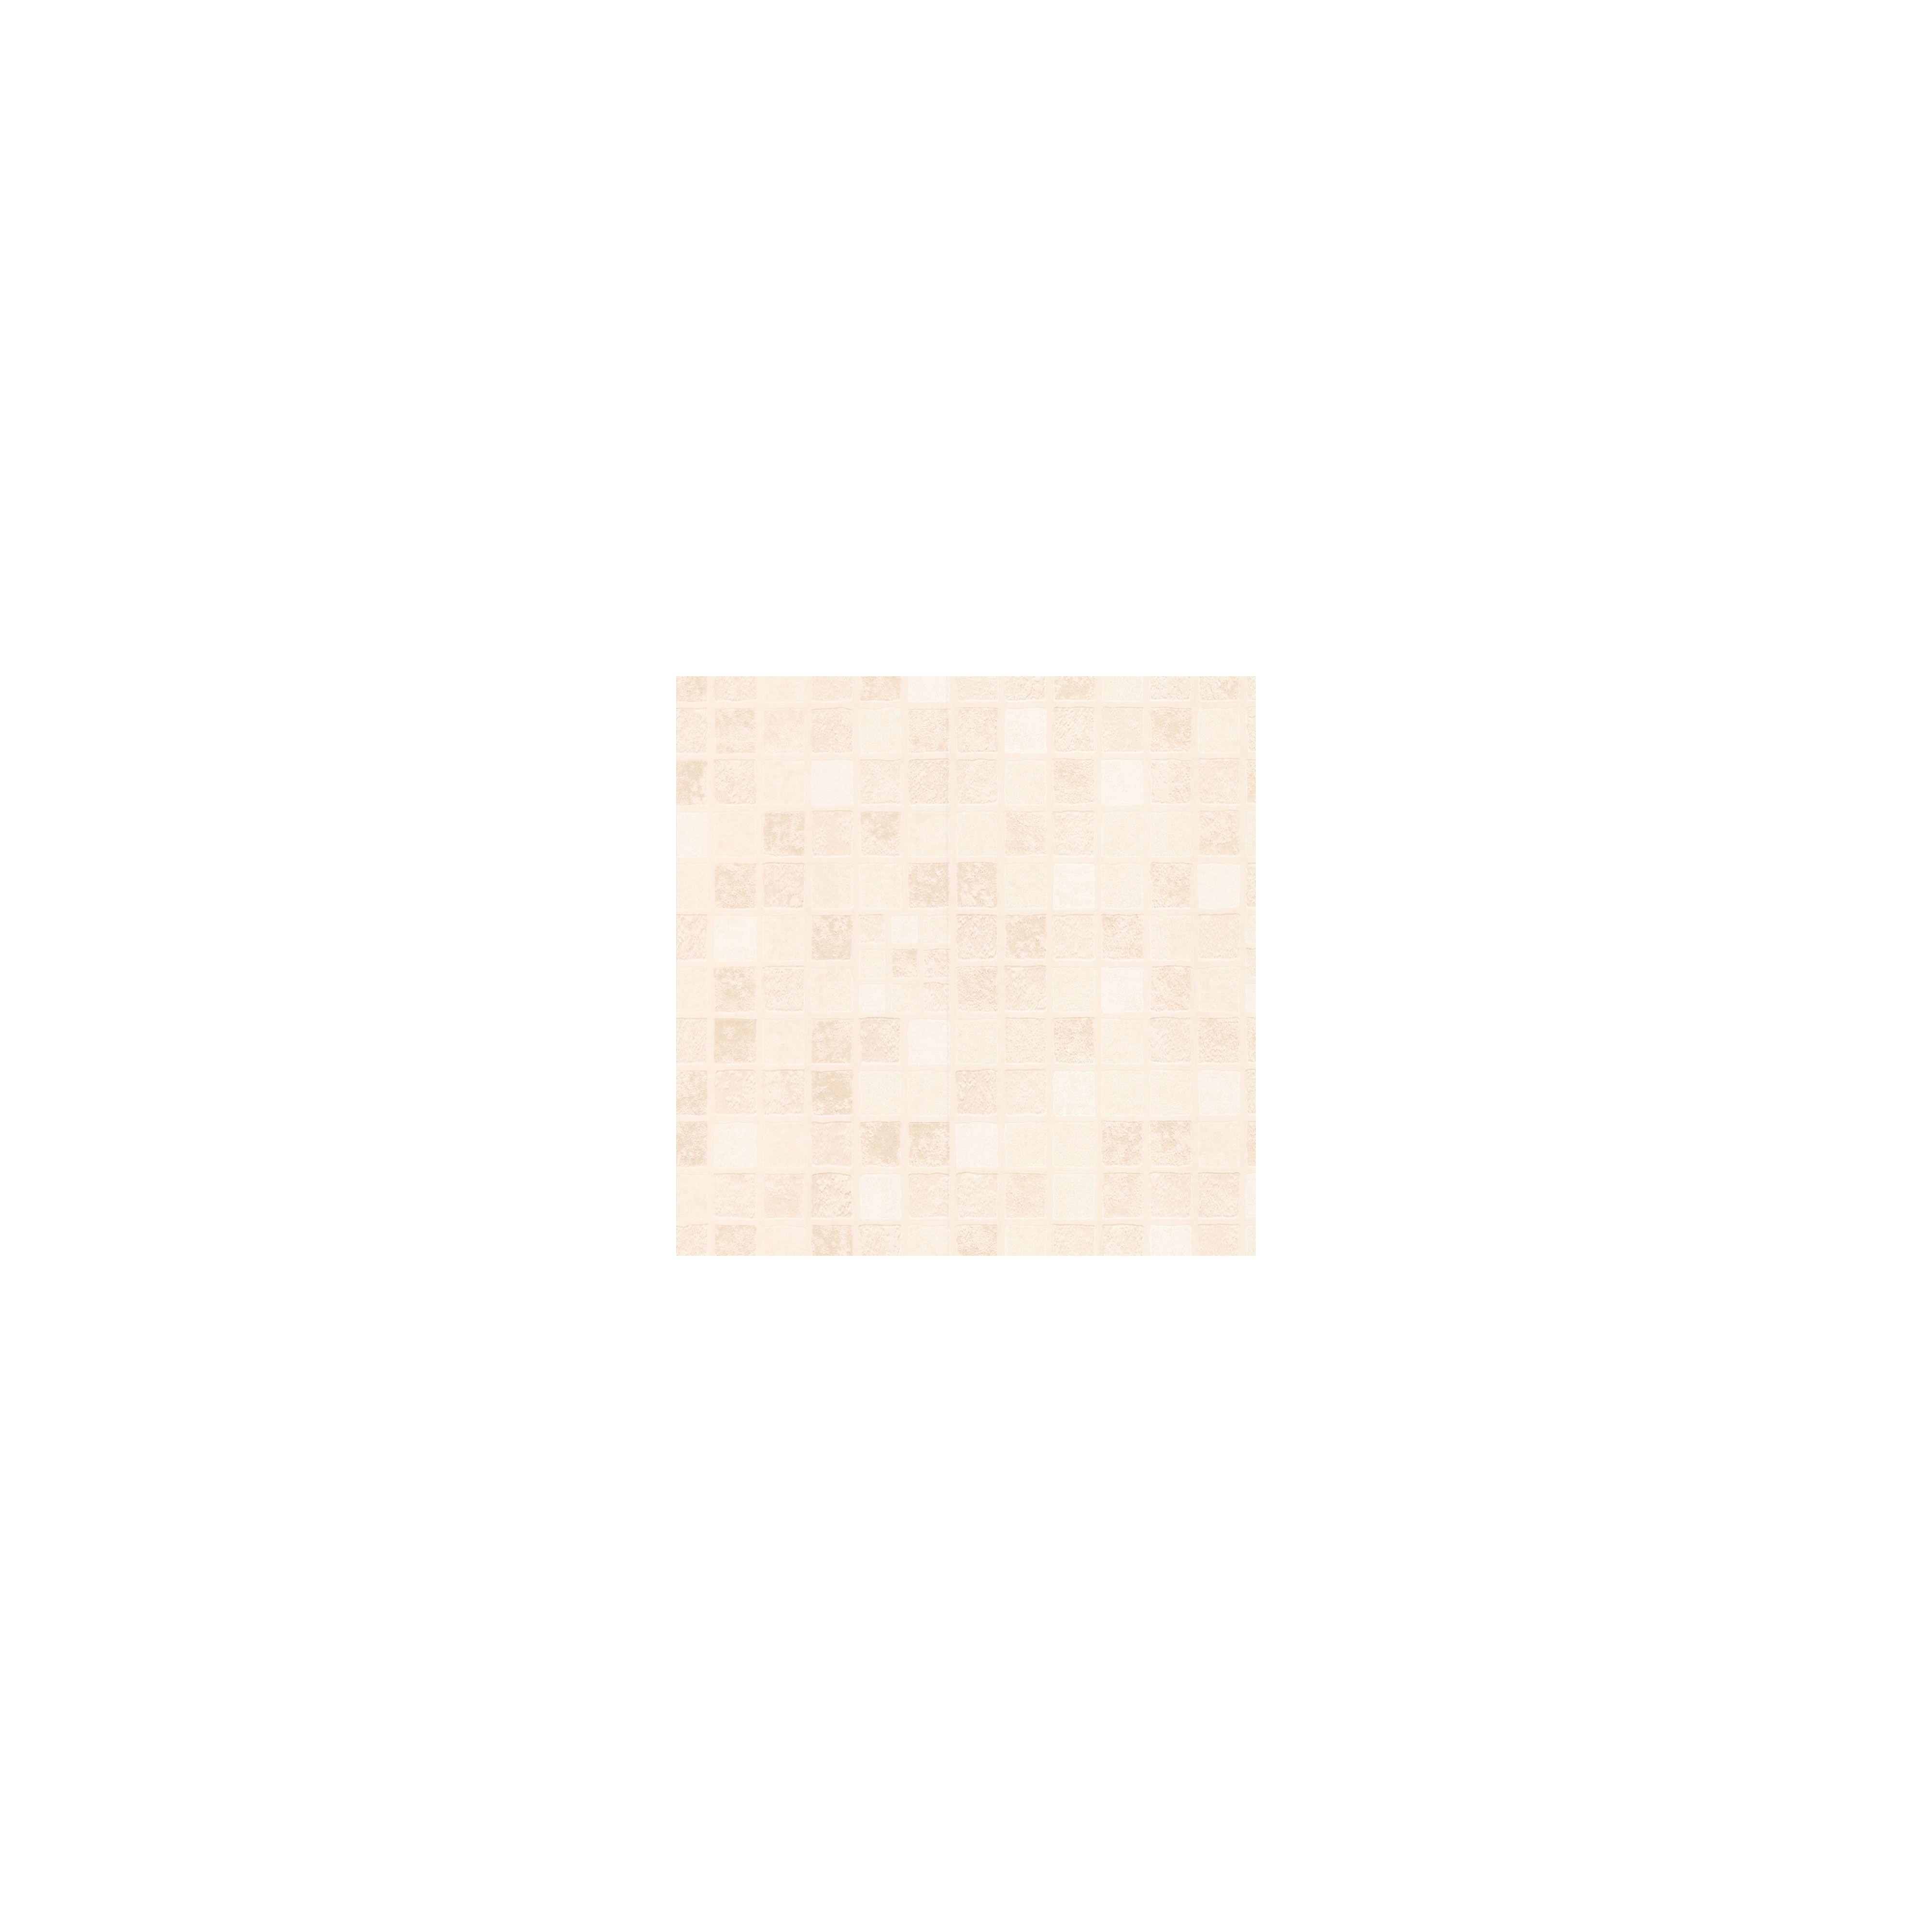 Contour Earthern Beige Wallpaper